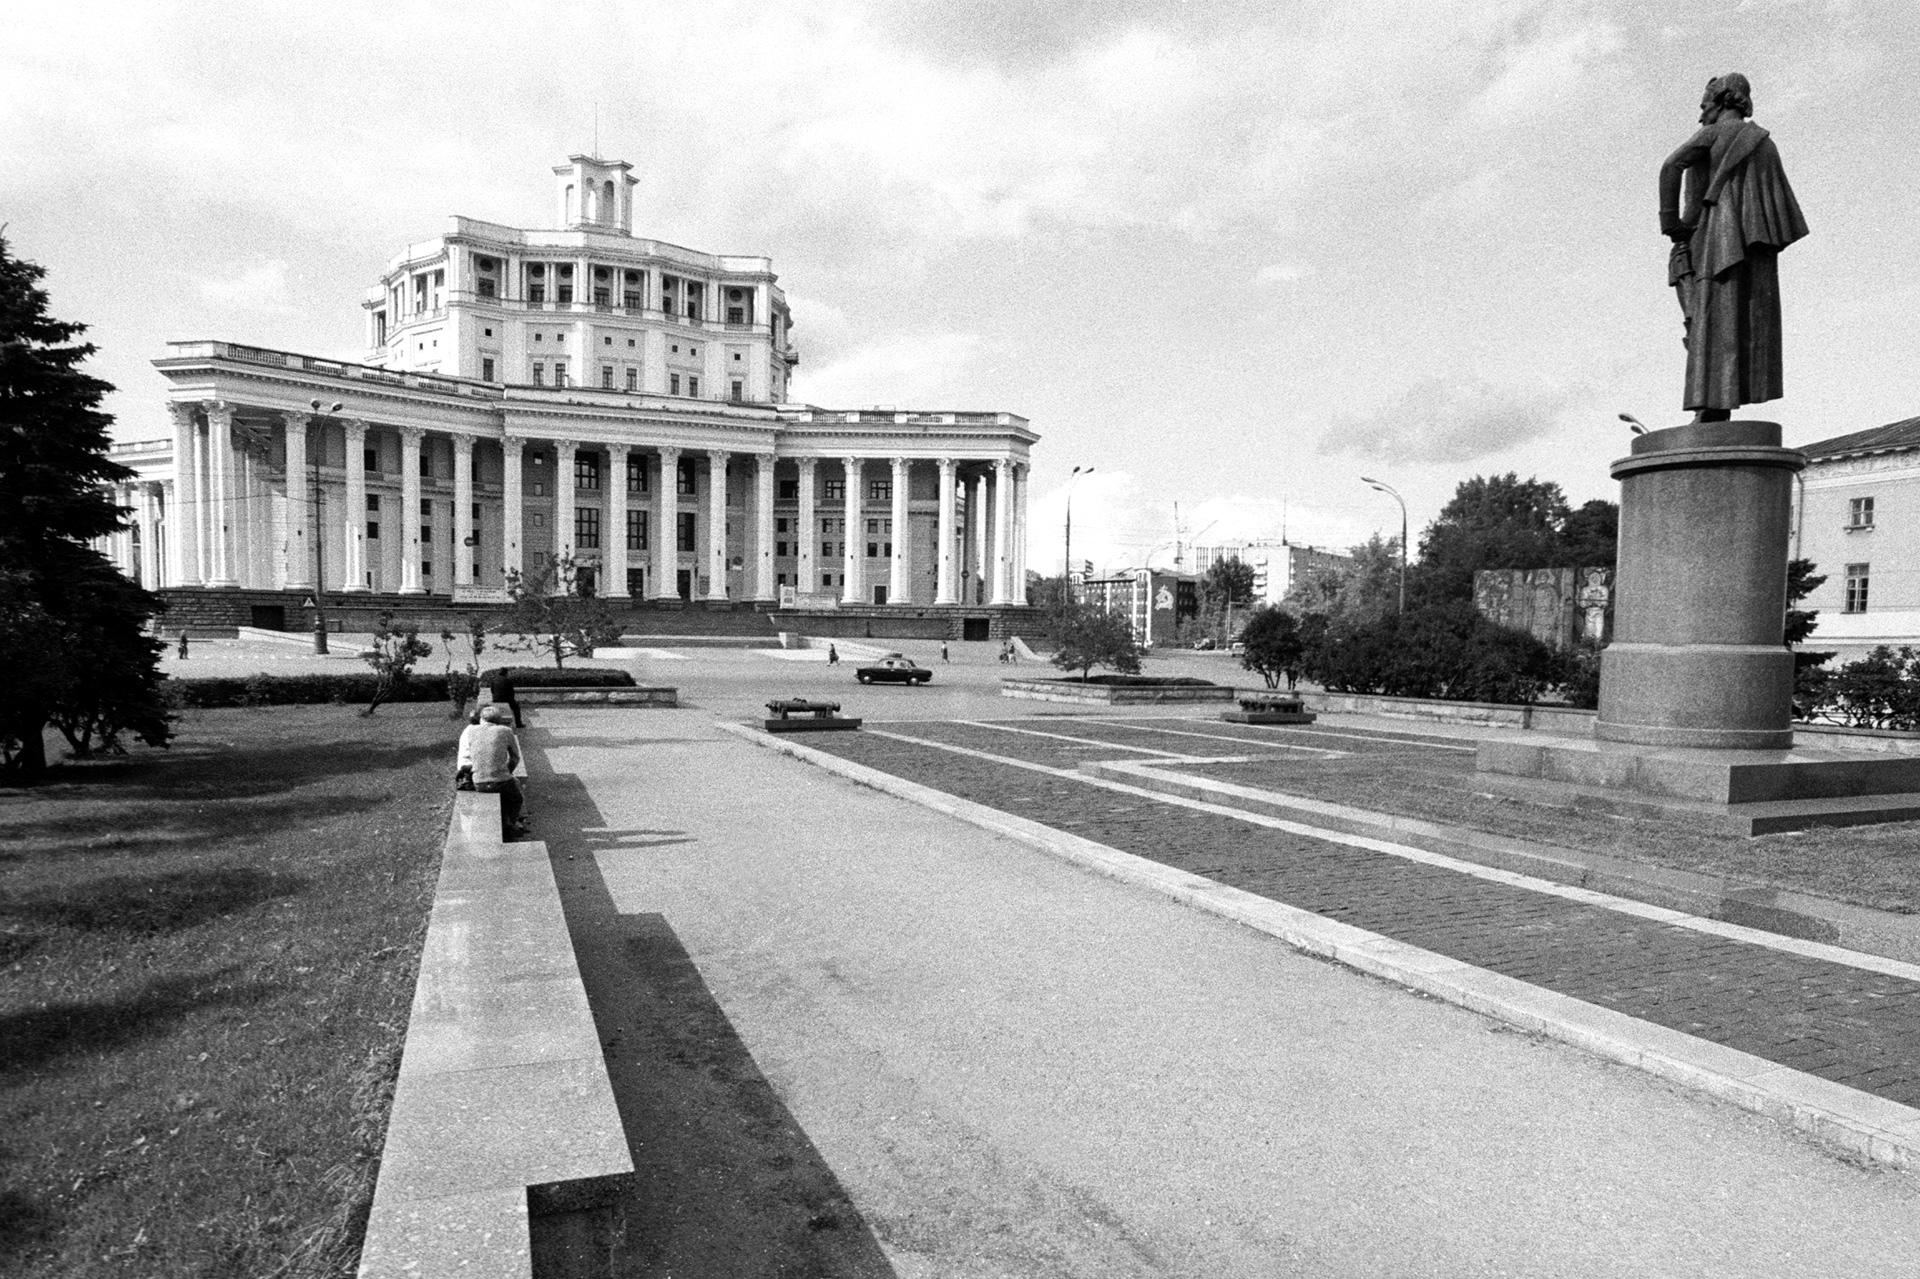 A public garden on Kommuny Square in front of the Central Academic Soviet Army Theater. Source: Vitaliy Karpov/RIA Novosti